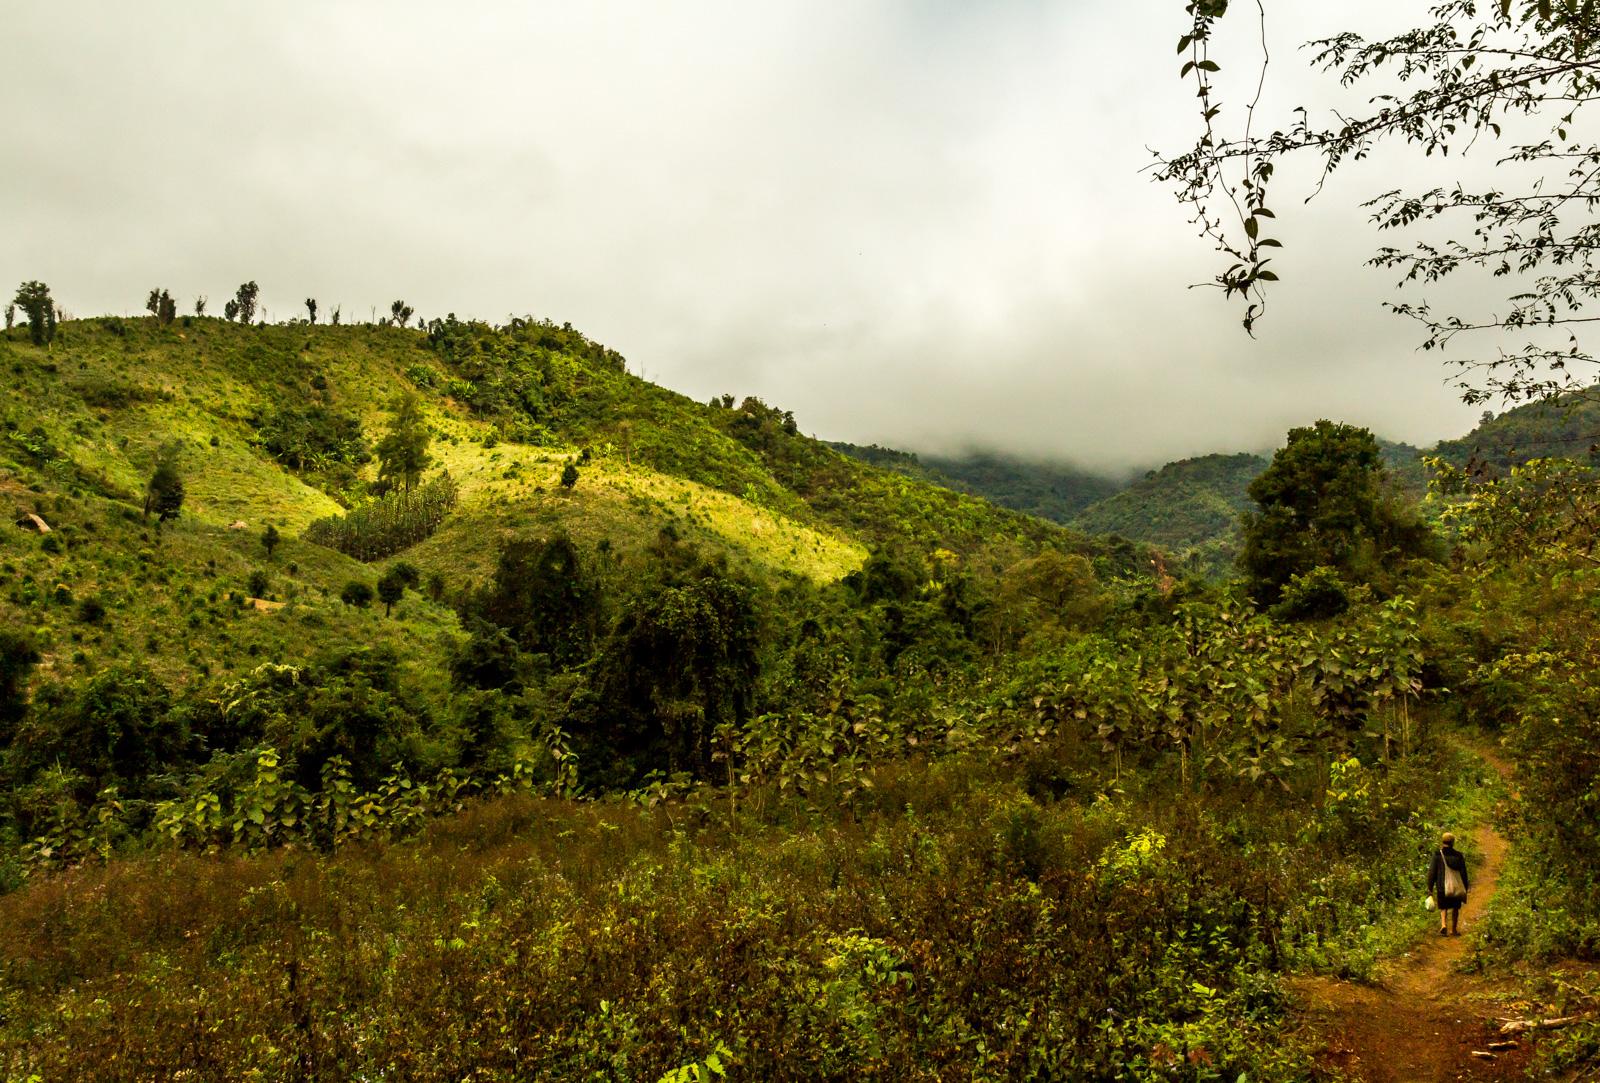 The trail passed through idyllic landscape.